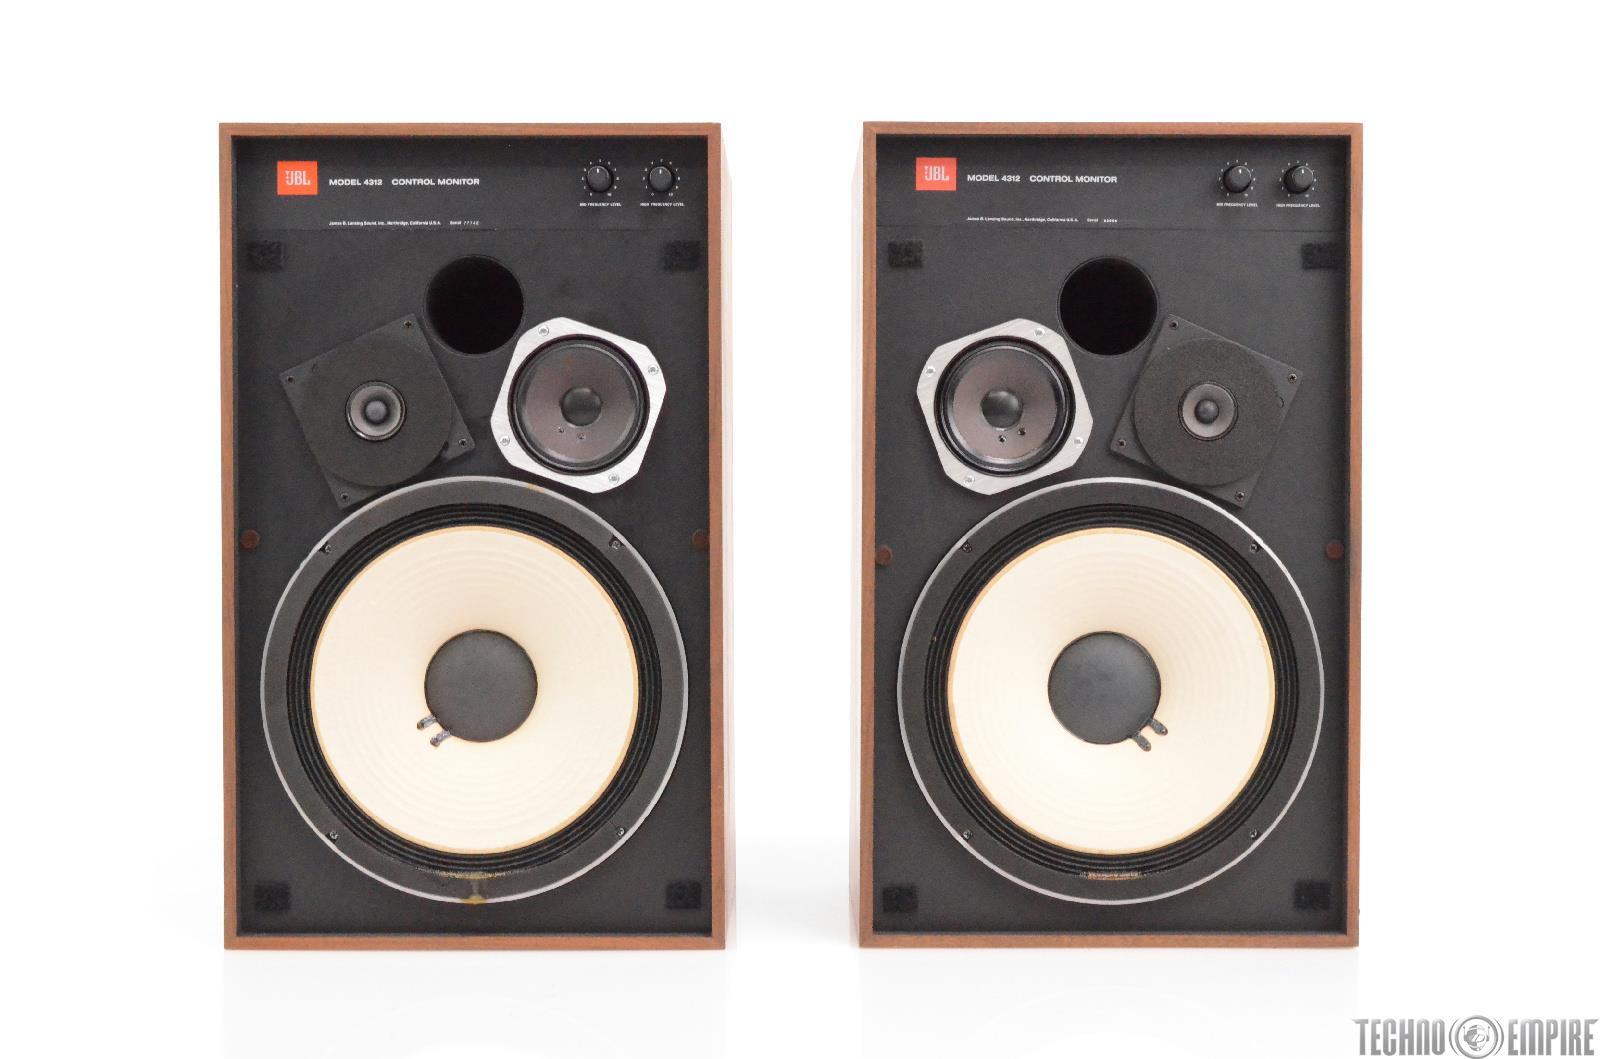 "JBL Model 4312 Control Monitor 3 Way 12"" Studio Reference Speakers PAIR #29433"